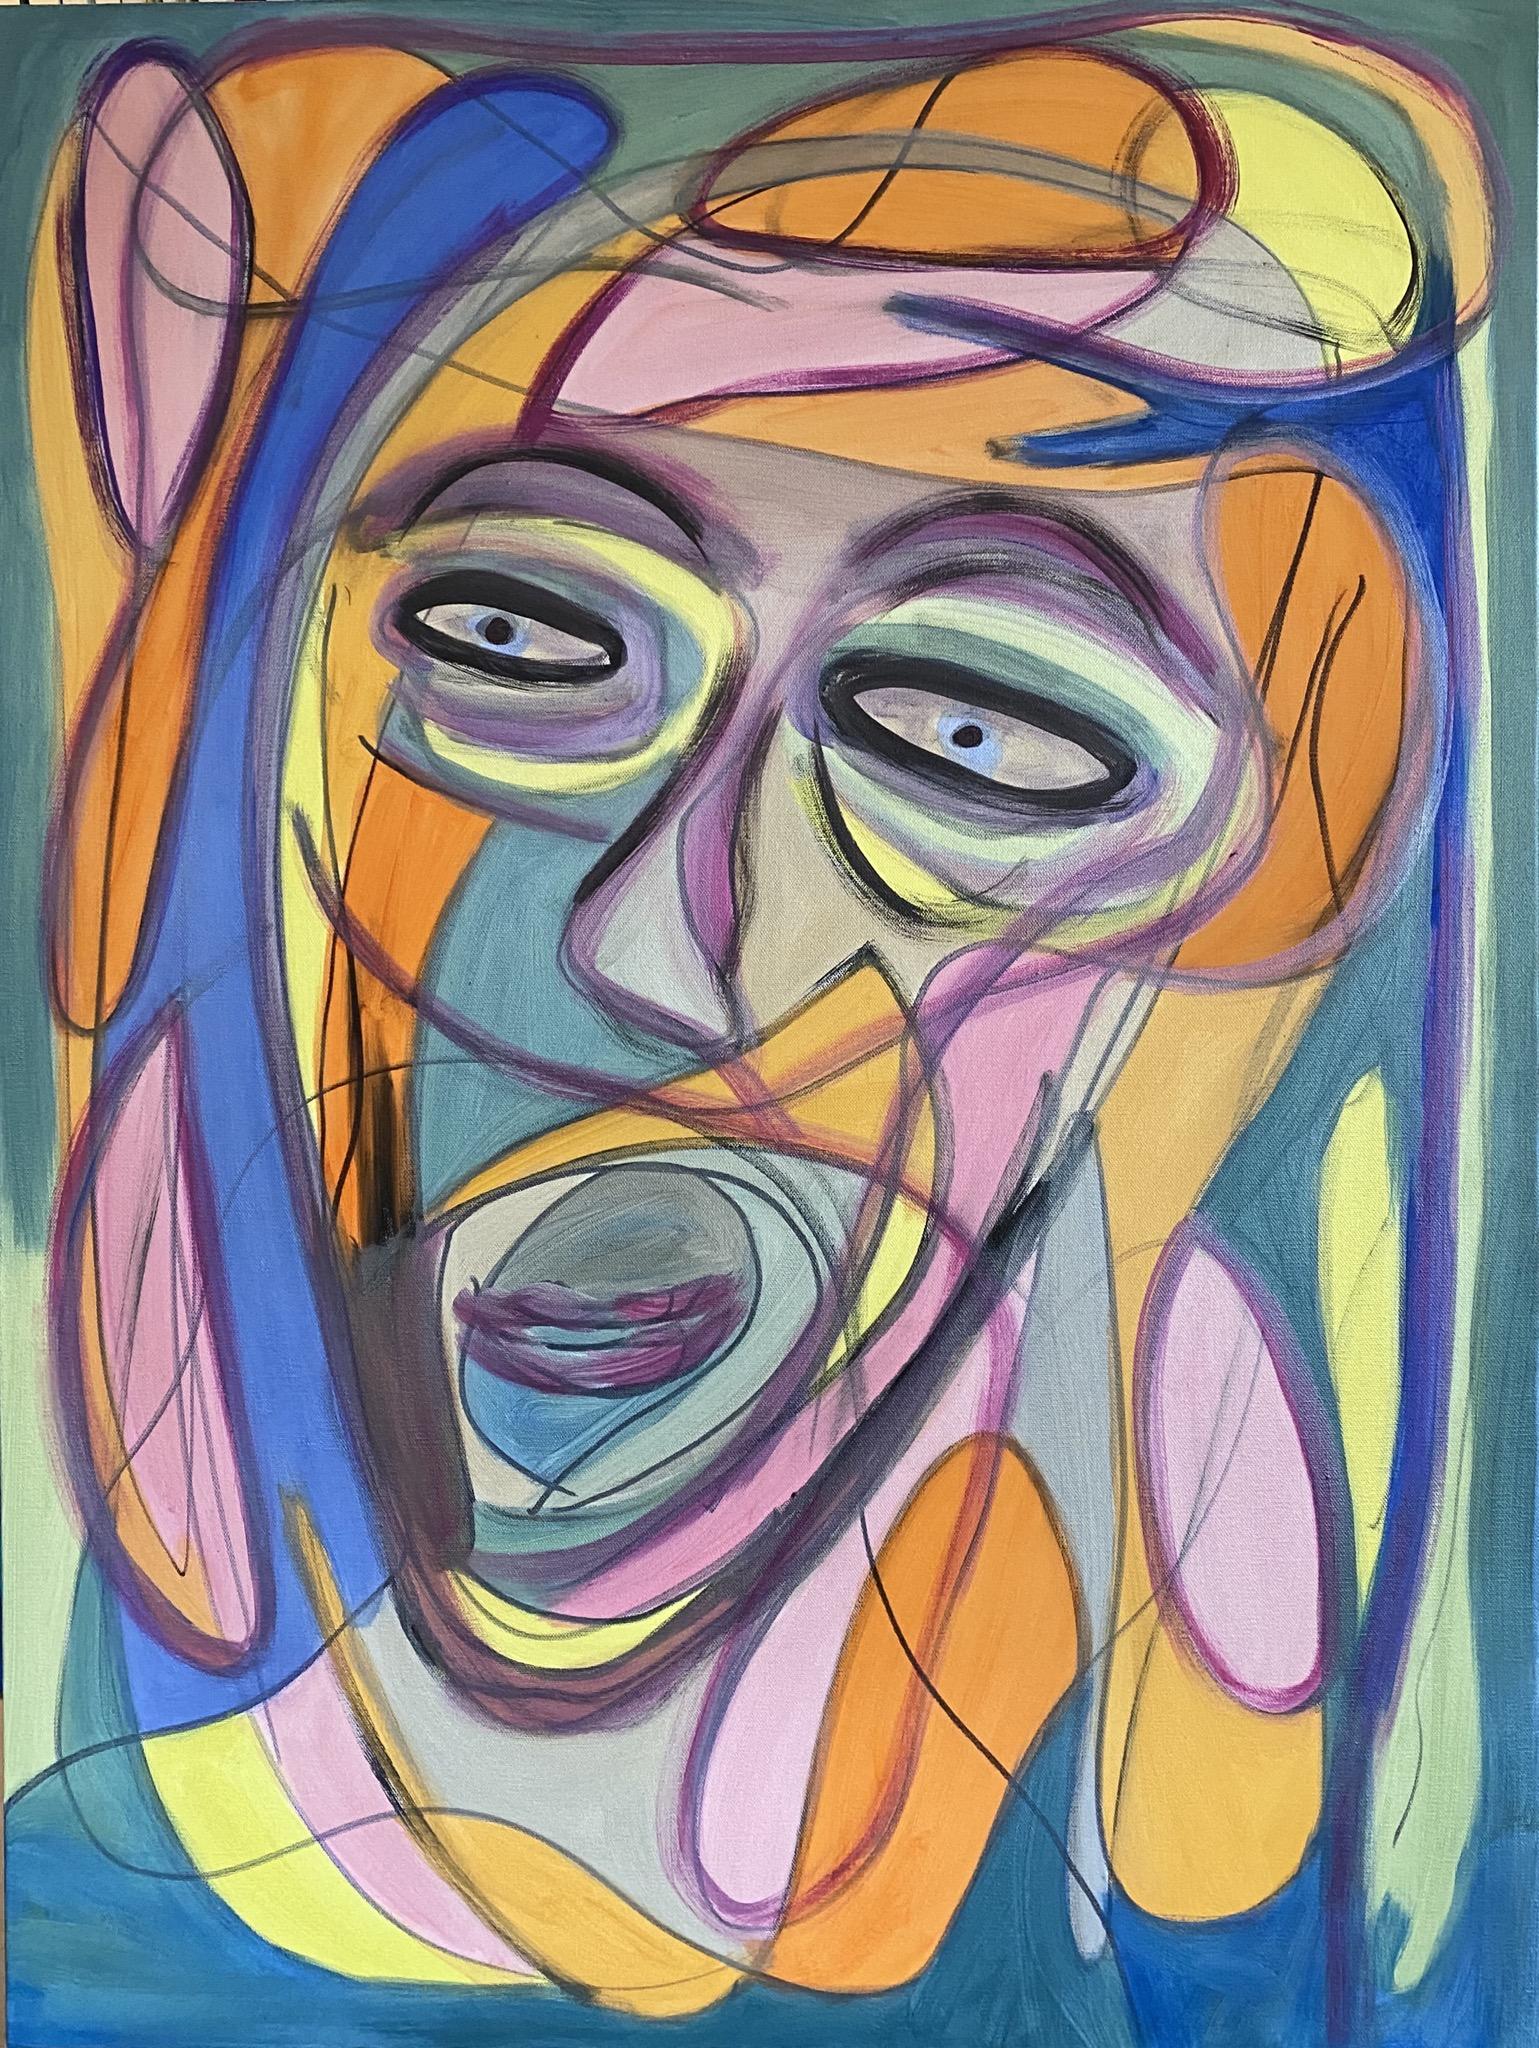 Overload - John Bacon